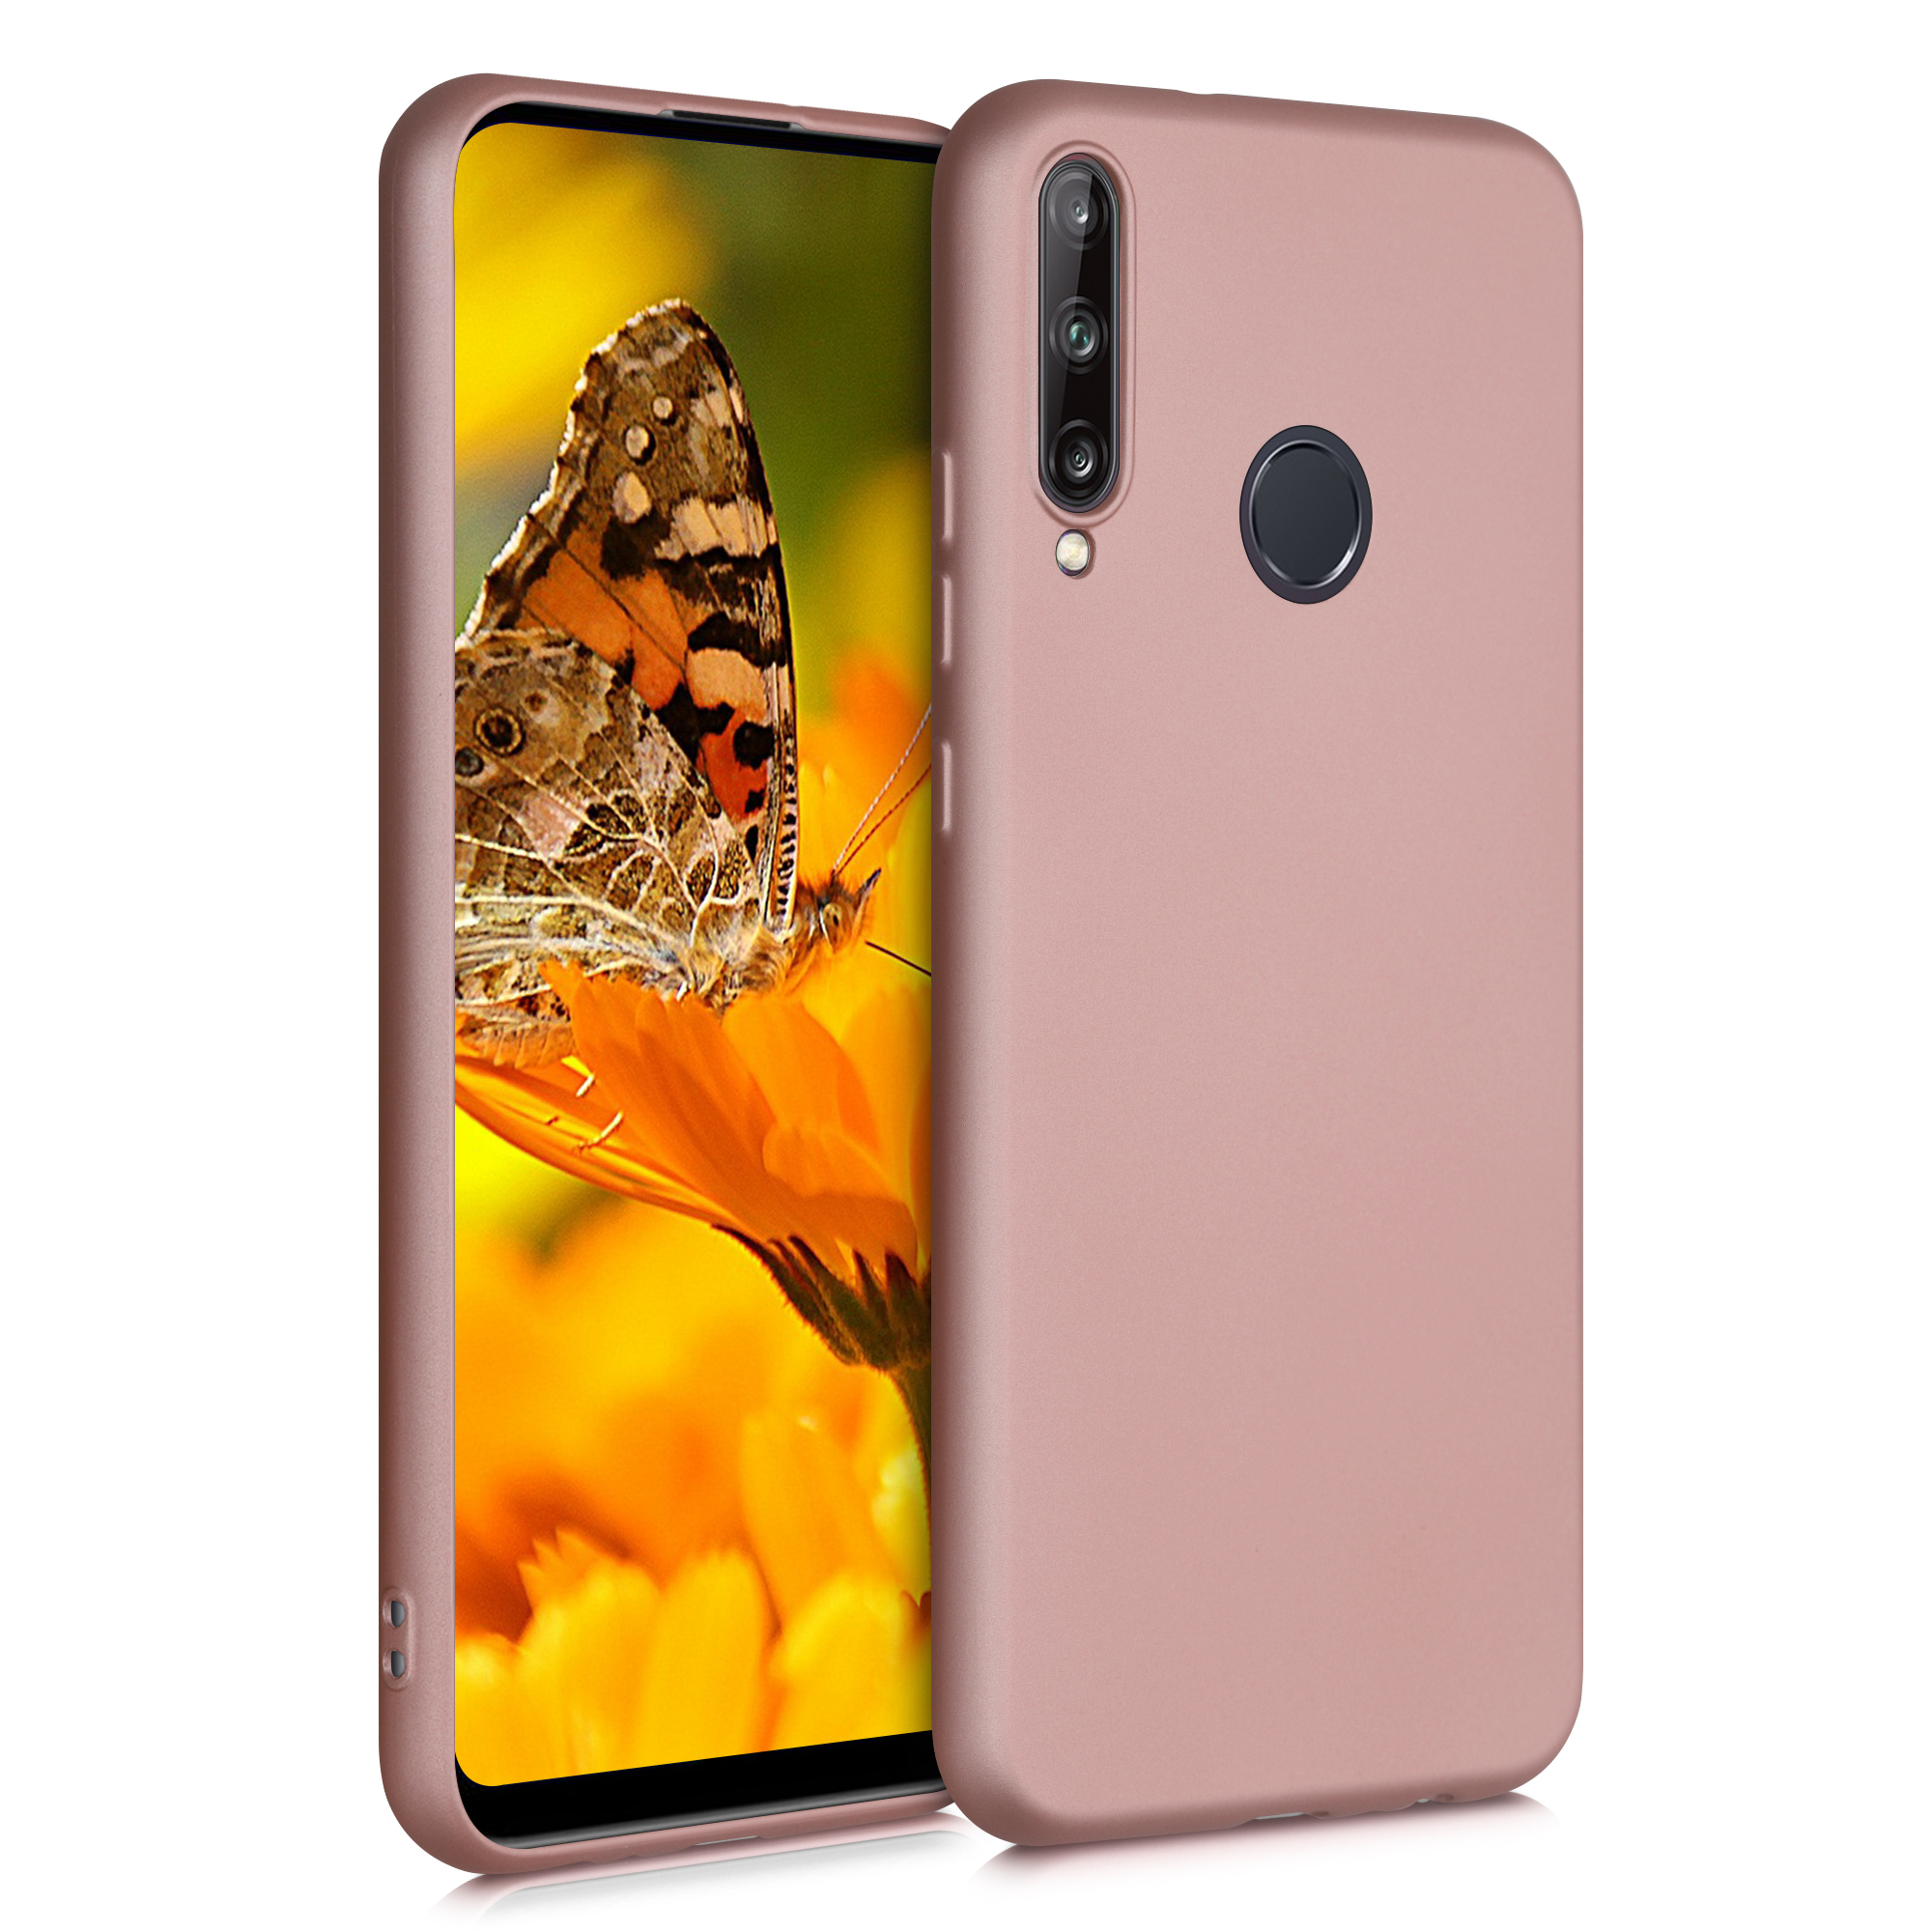 Růžové rosegold silikonové pouzdro / obal pro Huawei P40 Lite E